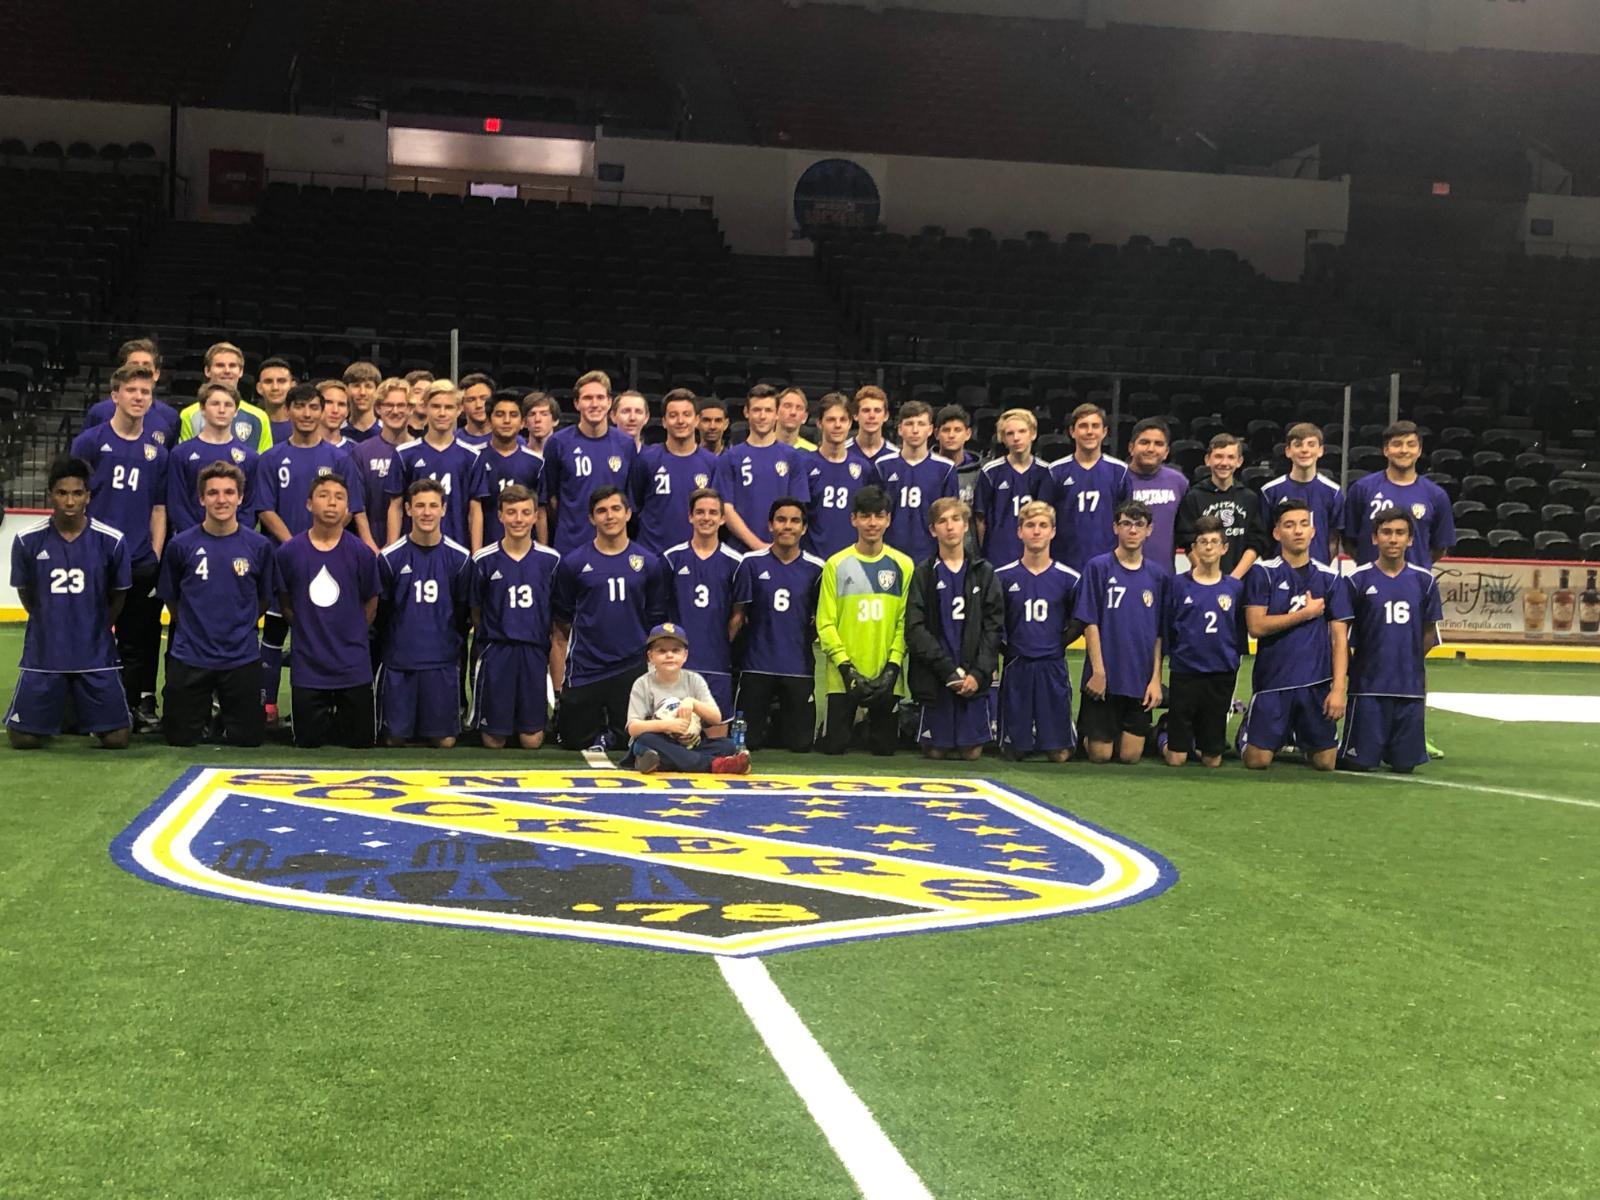 San Diego Sockers Night Boys Soccer